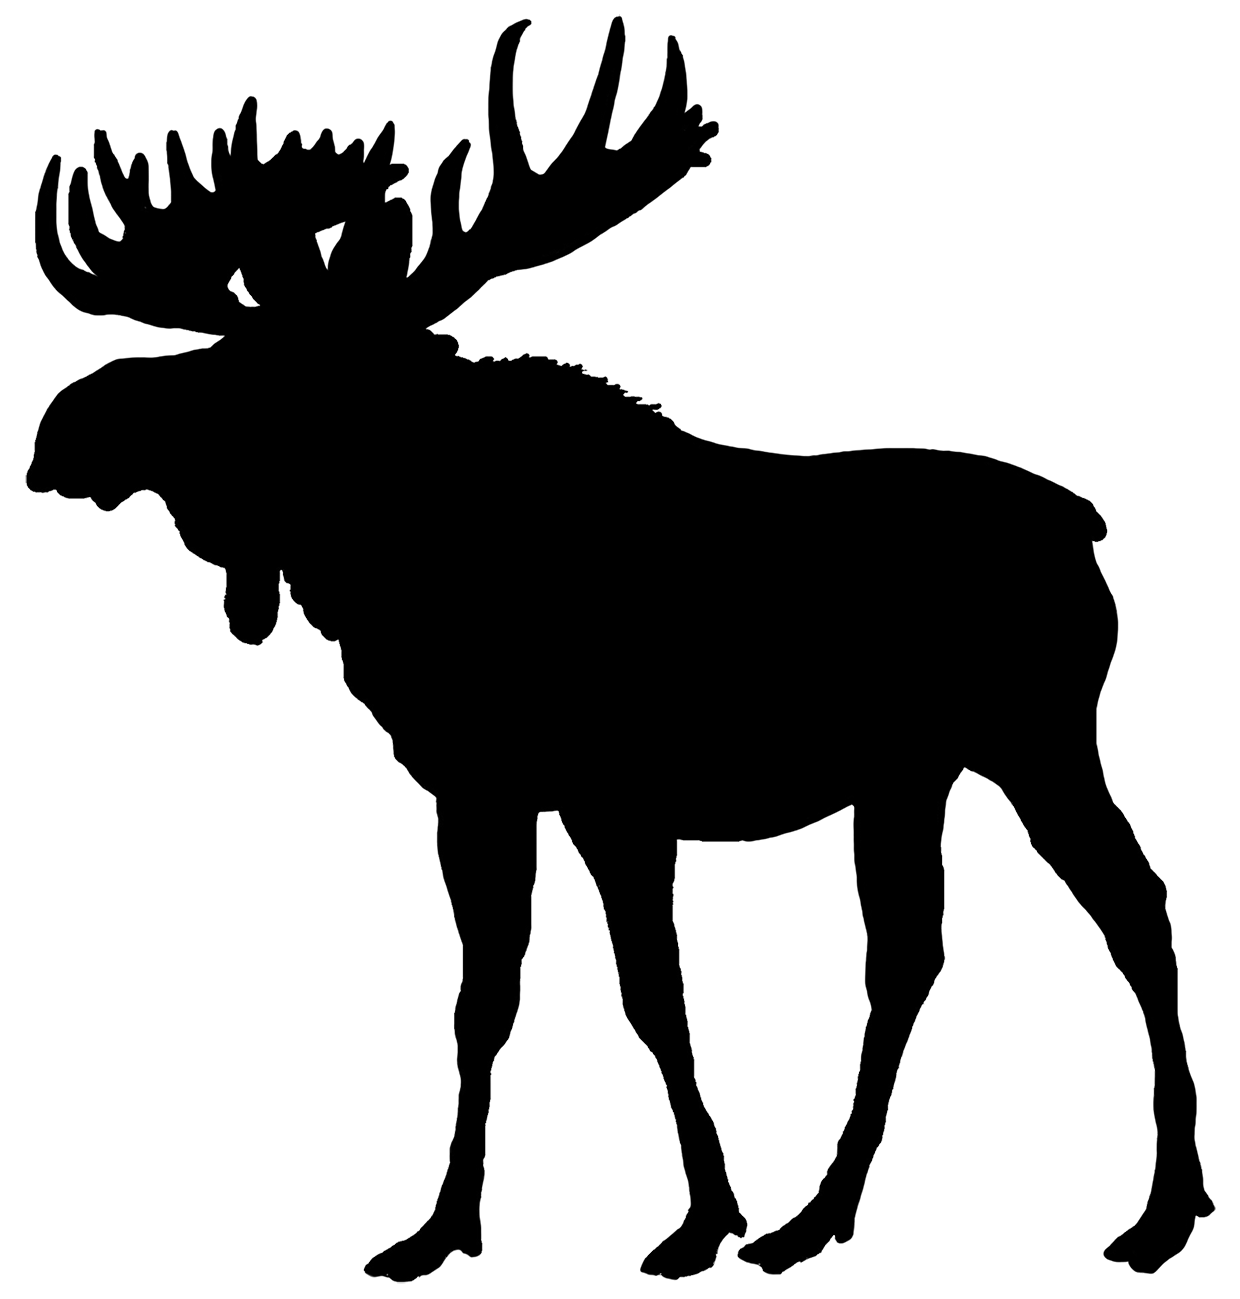 Kangaroo clipart silhouette. Moose deer clip art